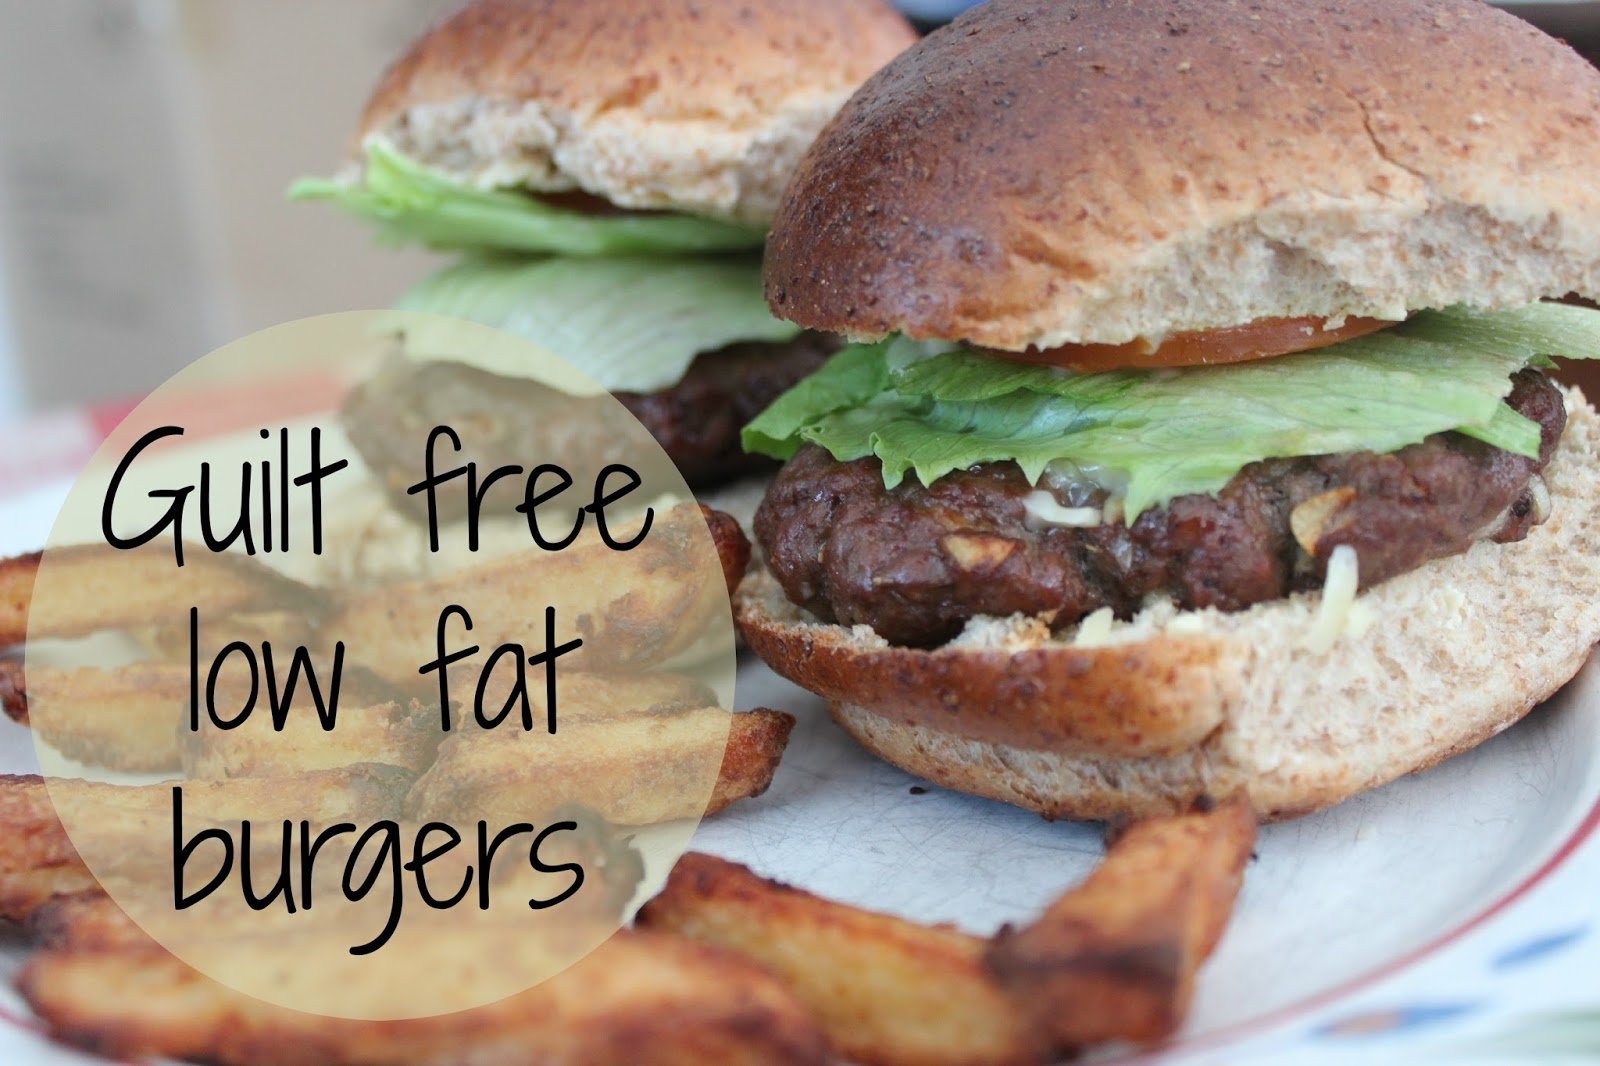 GUILT FREE LOW FAT BURGER RECIPE